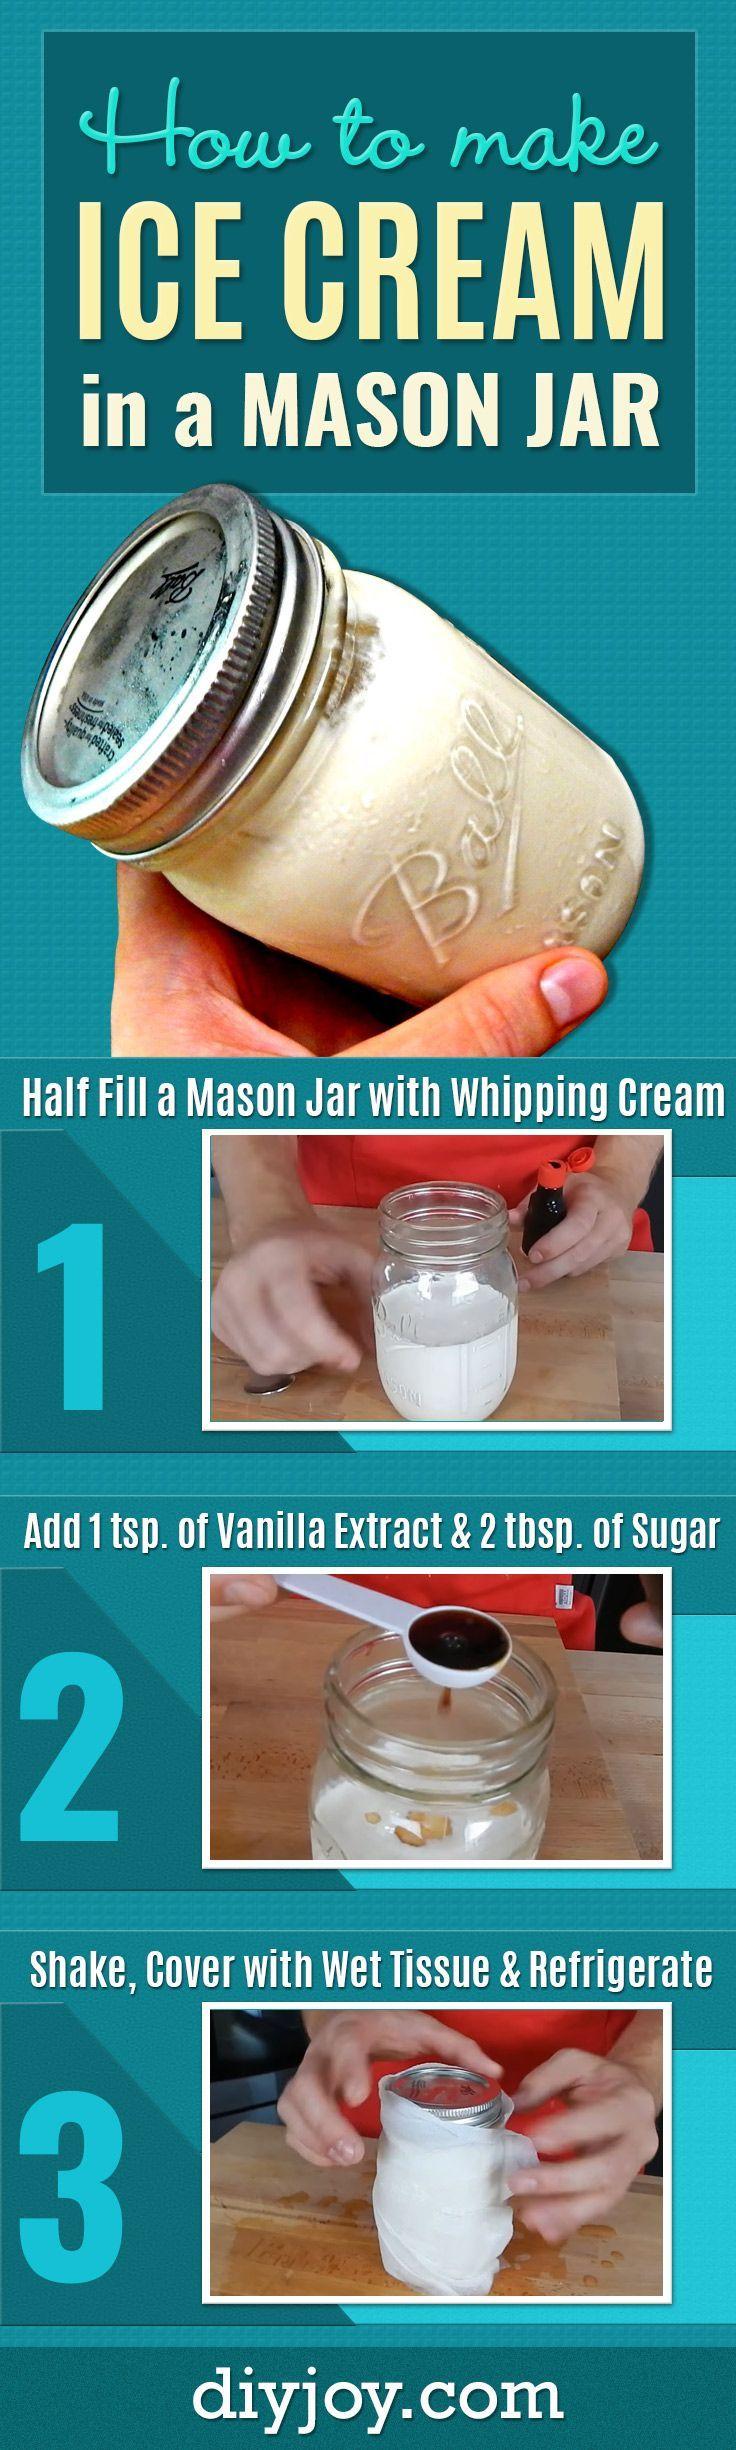 DIY Ice Cream - How To Make Homemade Ice Cream in a Mason Jar…